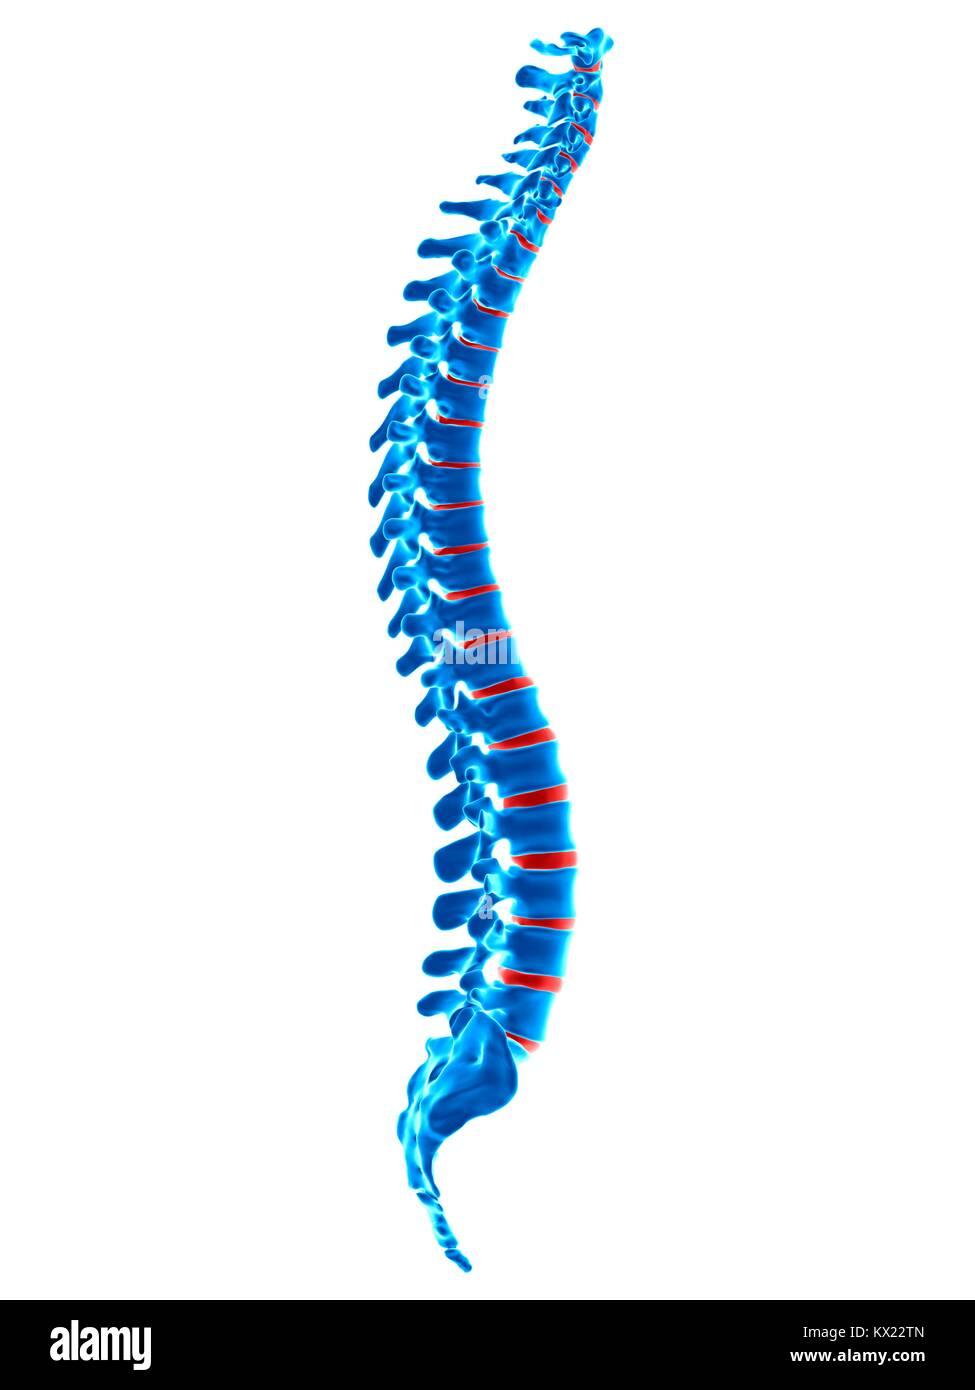 Human spinal vertebrae, illustration. - Stock Image